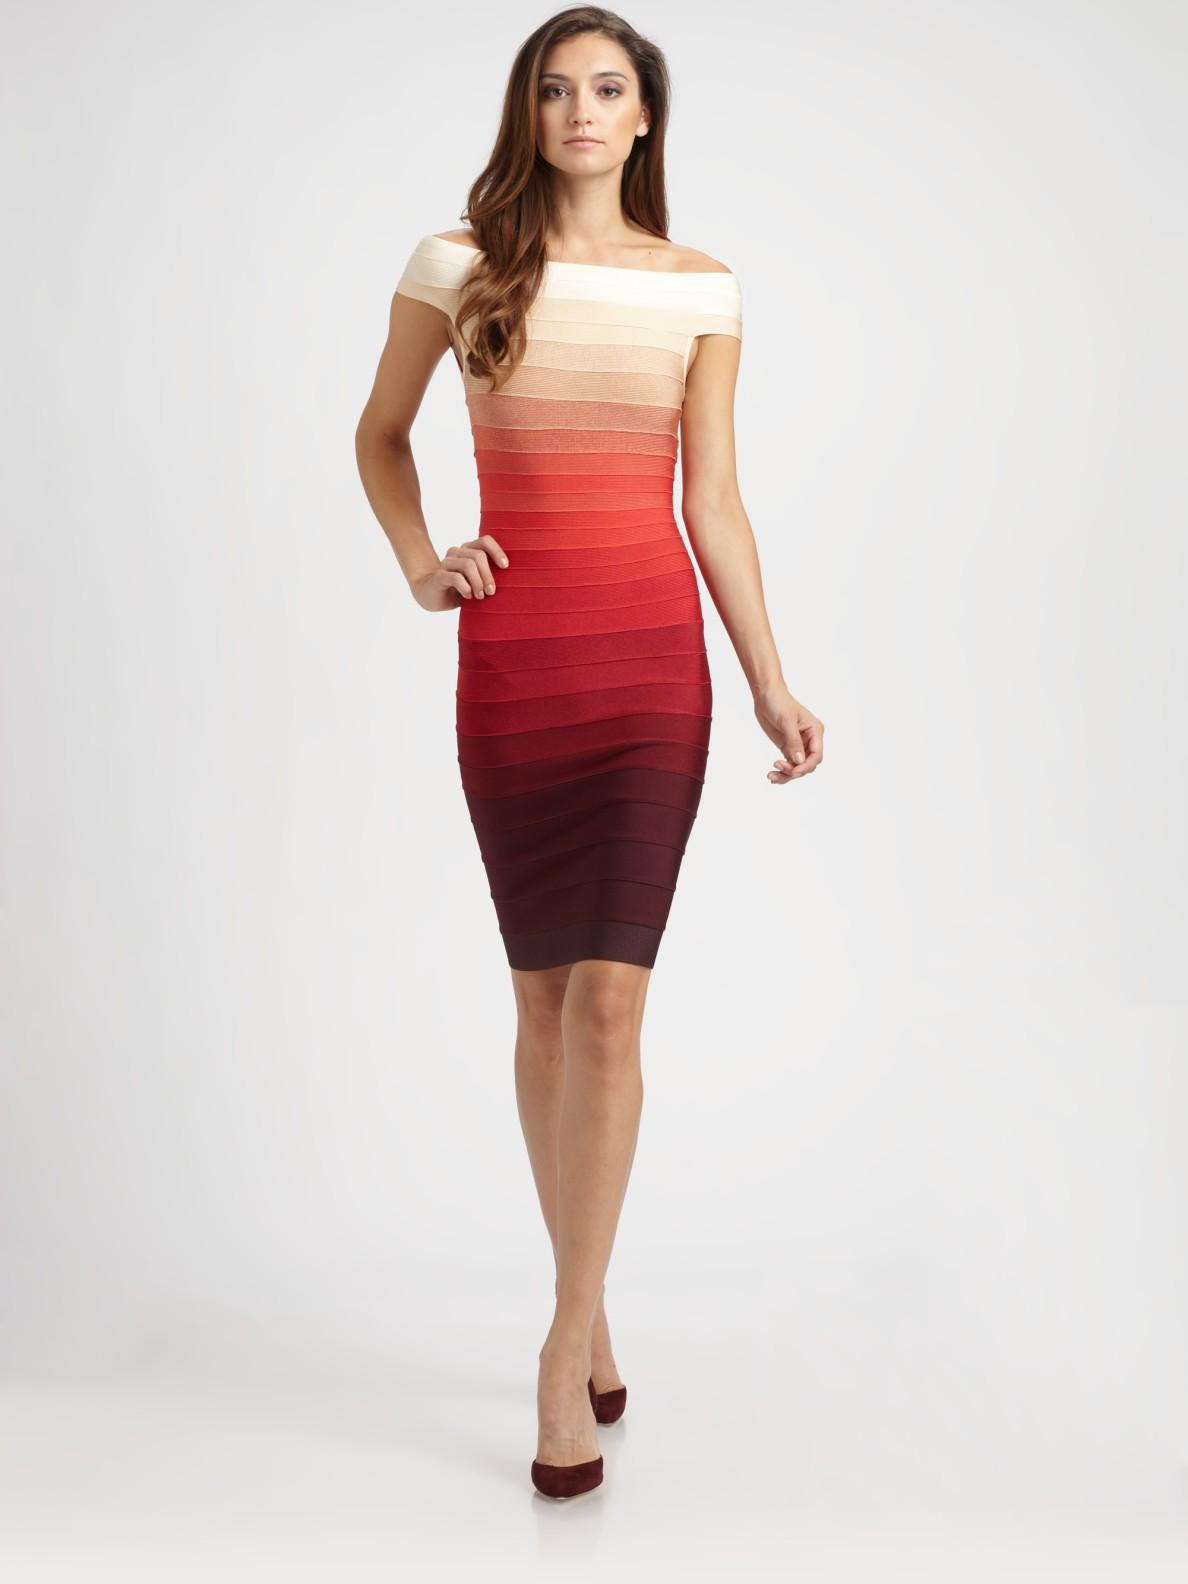 Herv U00e9 L U00e9ger Offtheshoulder Ombr U00e9 Bandage Dress In Mahogany